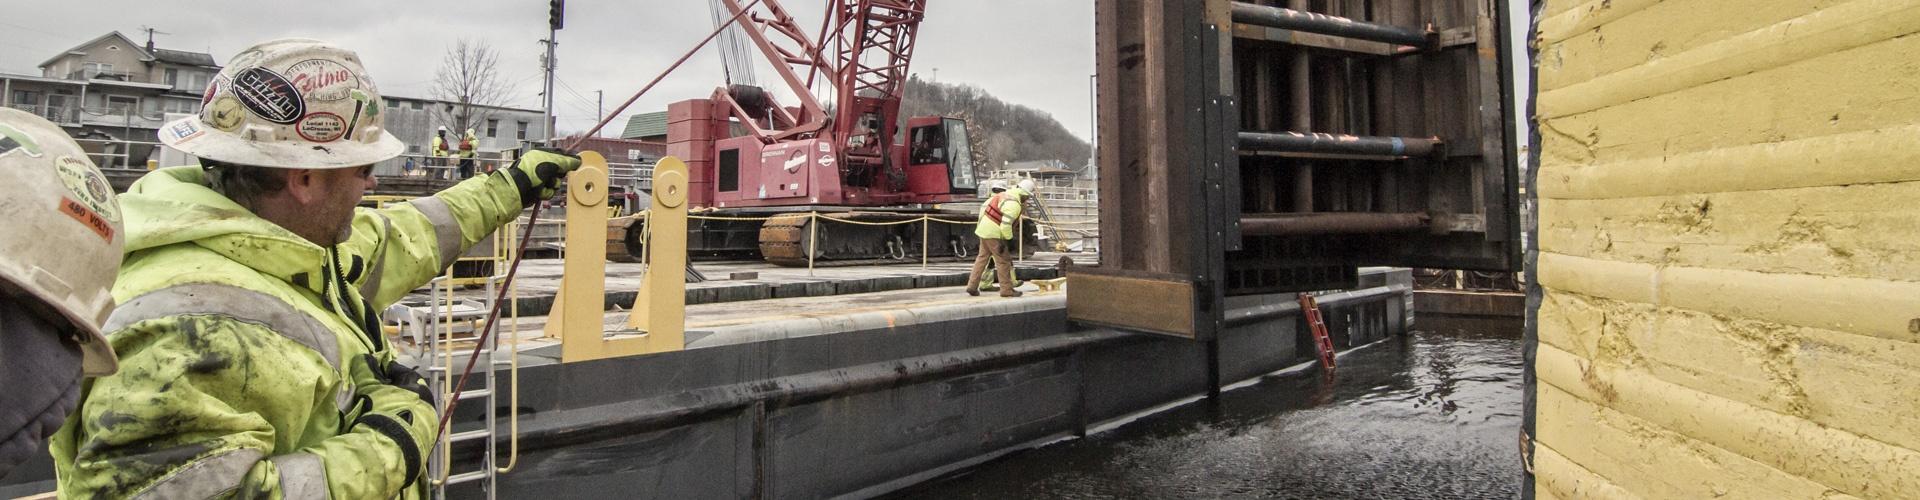 marine construction careers, dam construction careers, brennan